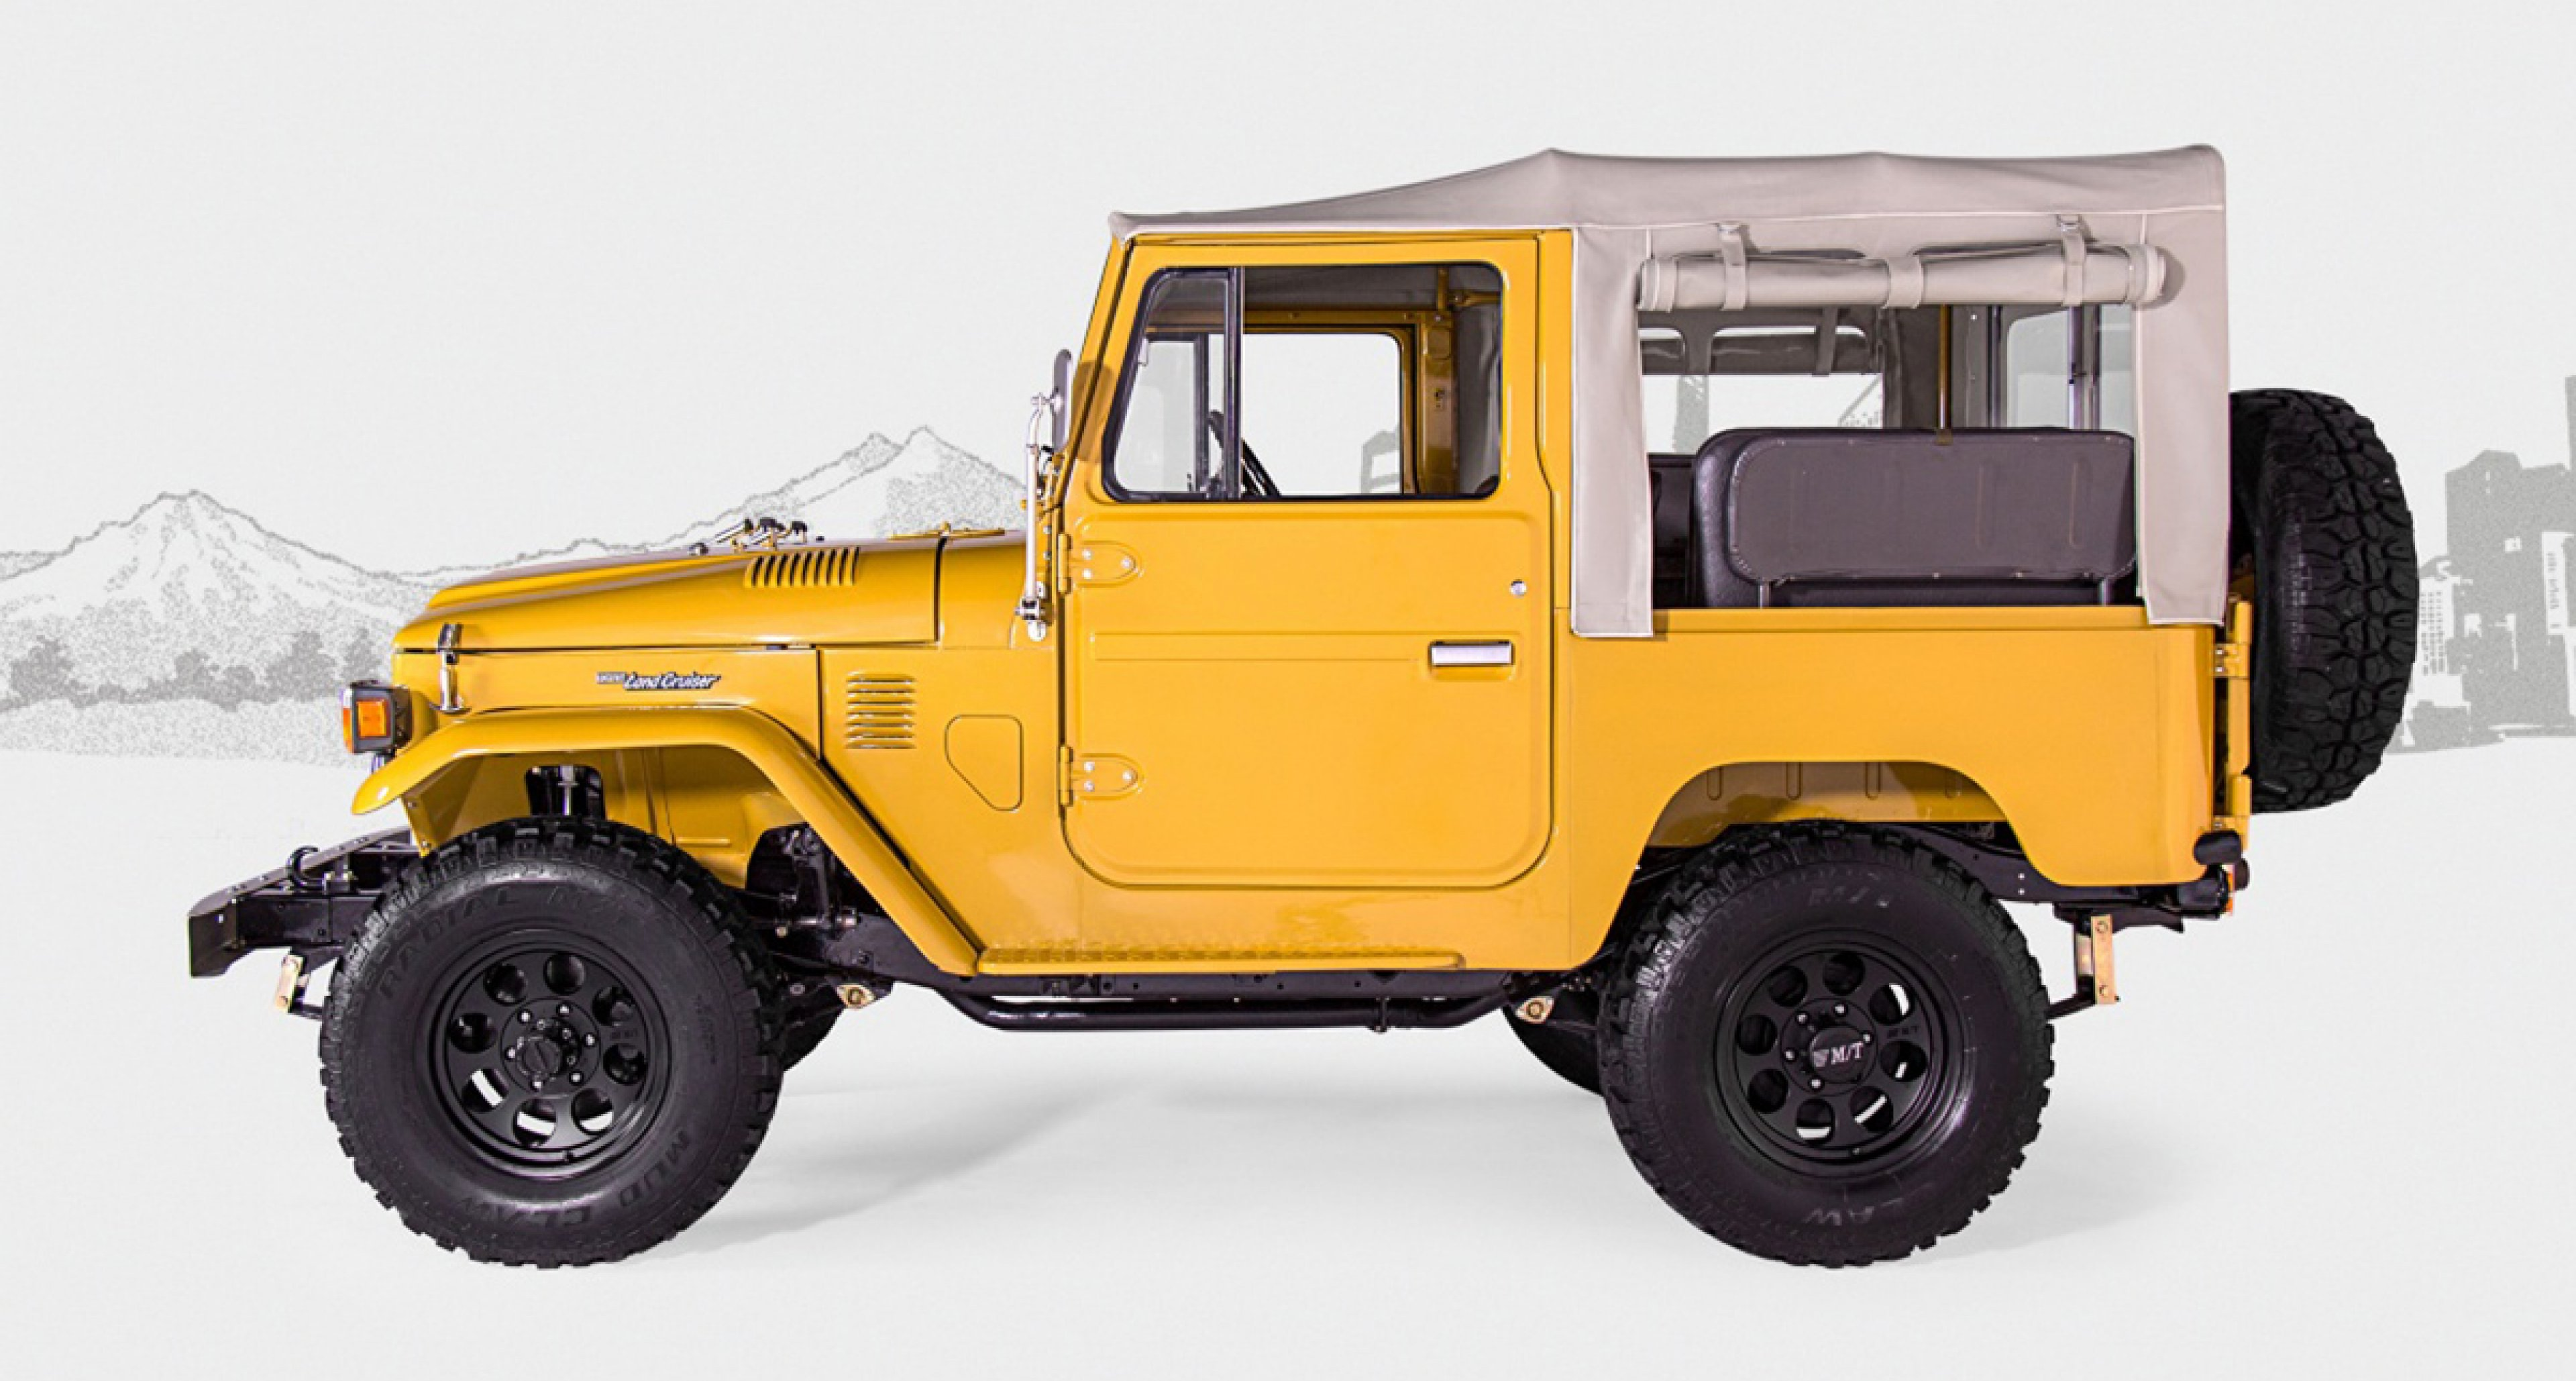 1972 Toyota Land Cruiser FJ40 by FJ Company